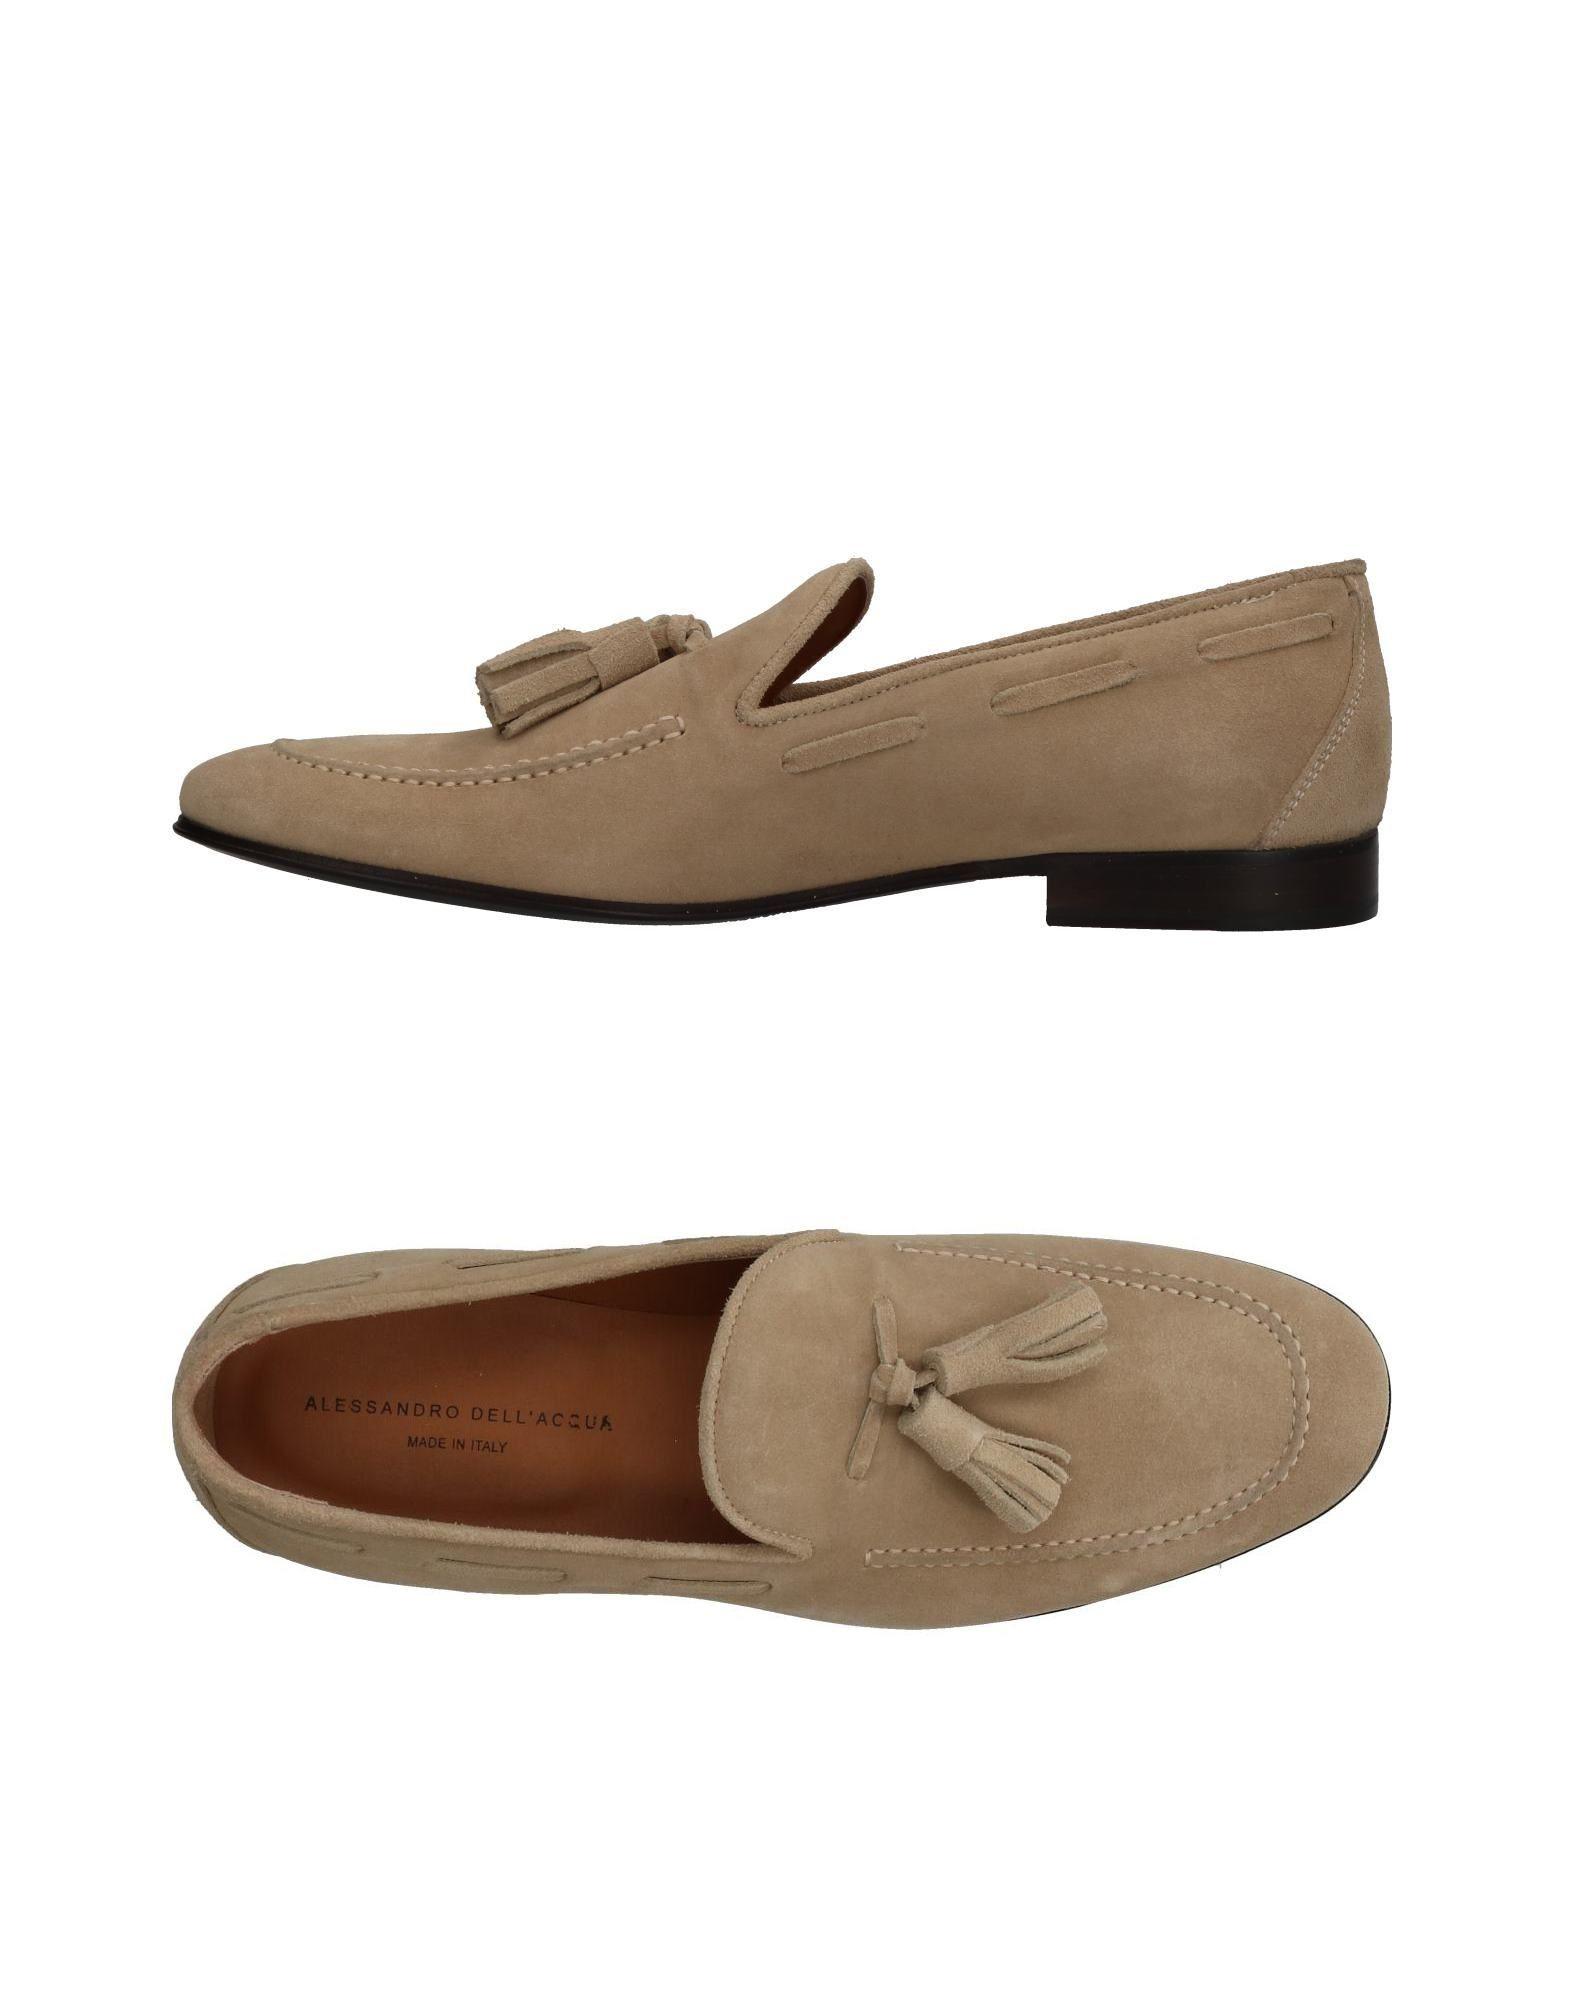 Alessandro Dell'acqua Mokassins Herren  11339061HJ Gute Qualität beliebte Schuhe